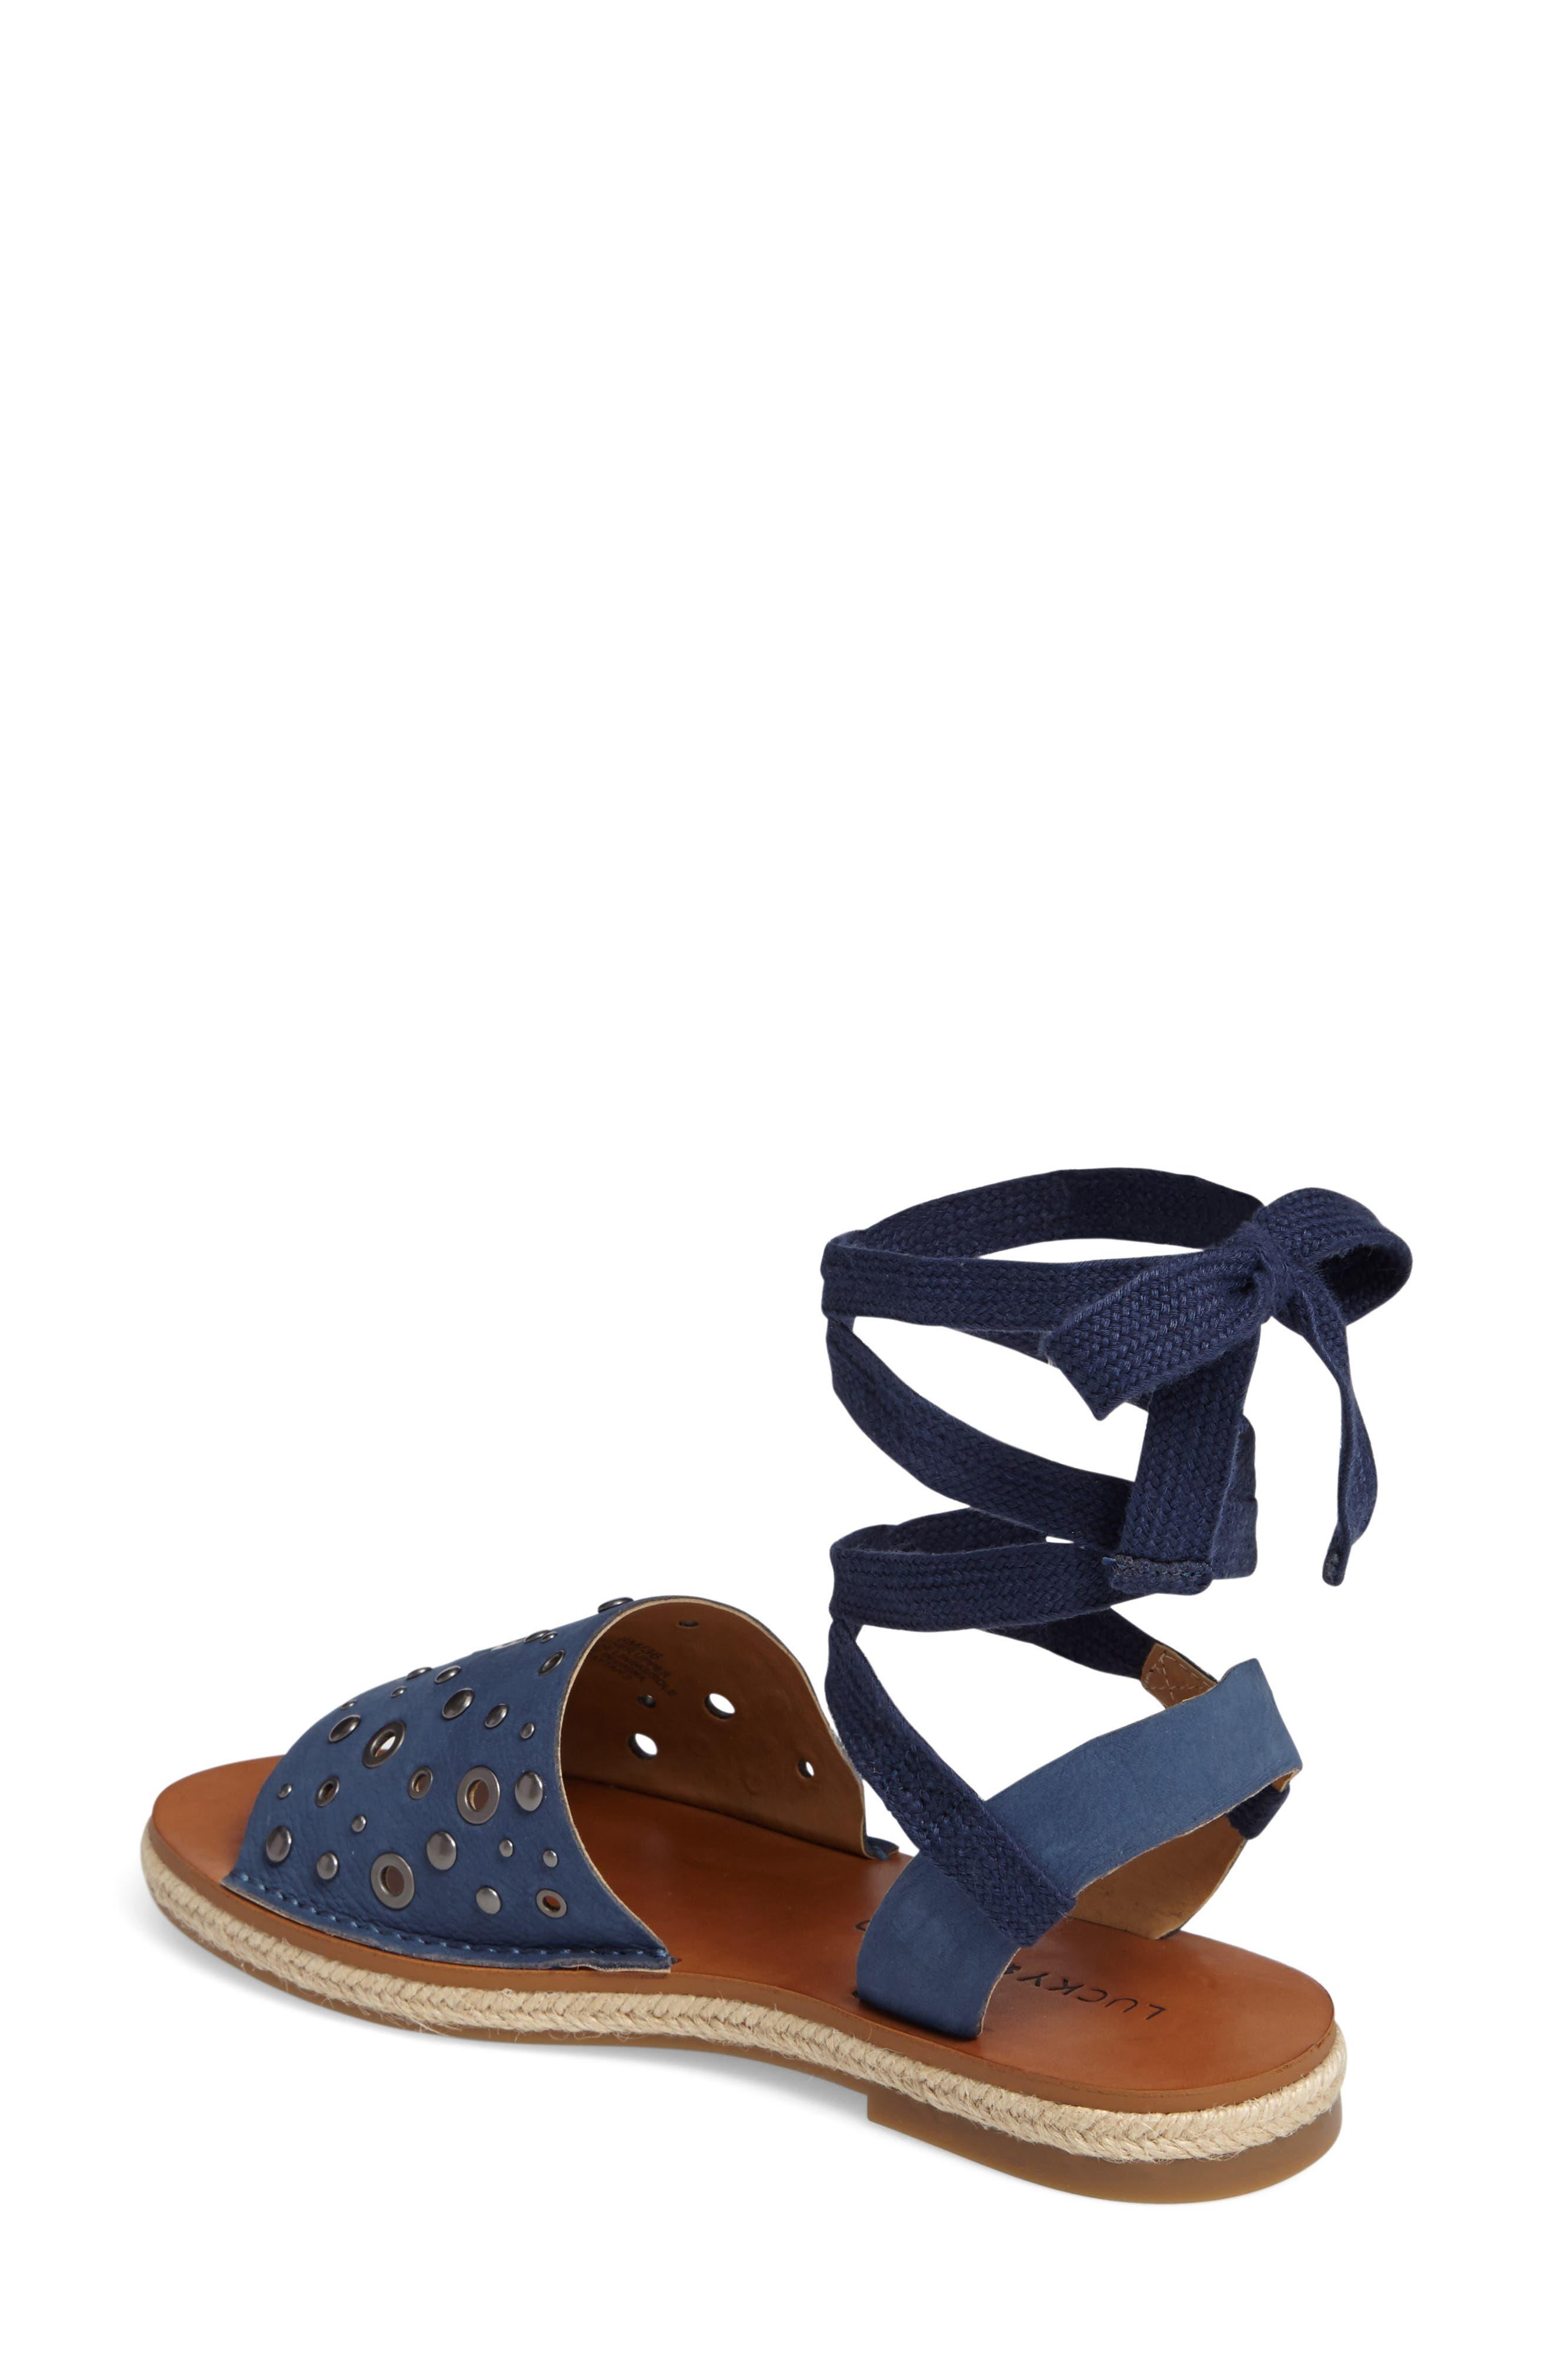 Daytah Ankle Tie Sandal,                             Alternate thumbnail 2, color,                             Dark Chambray